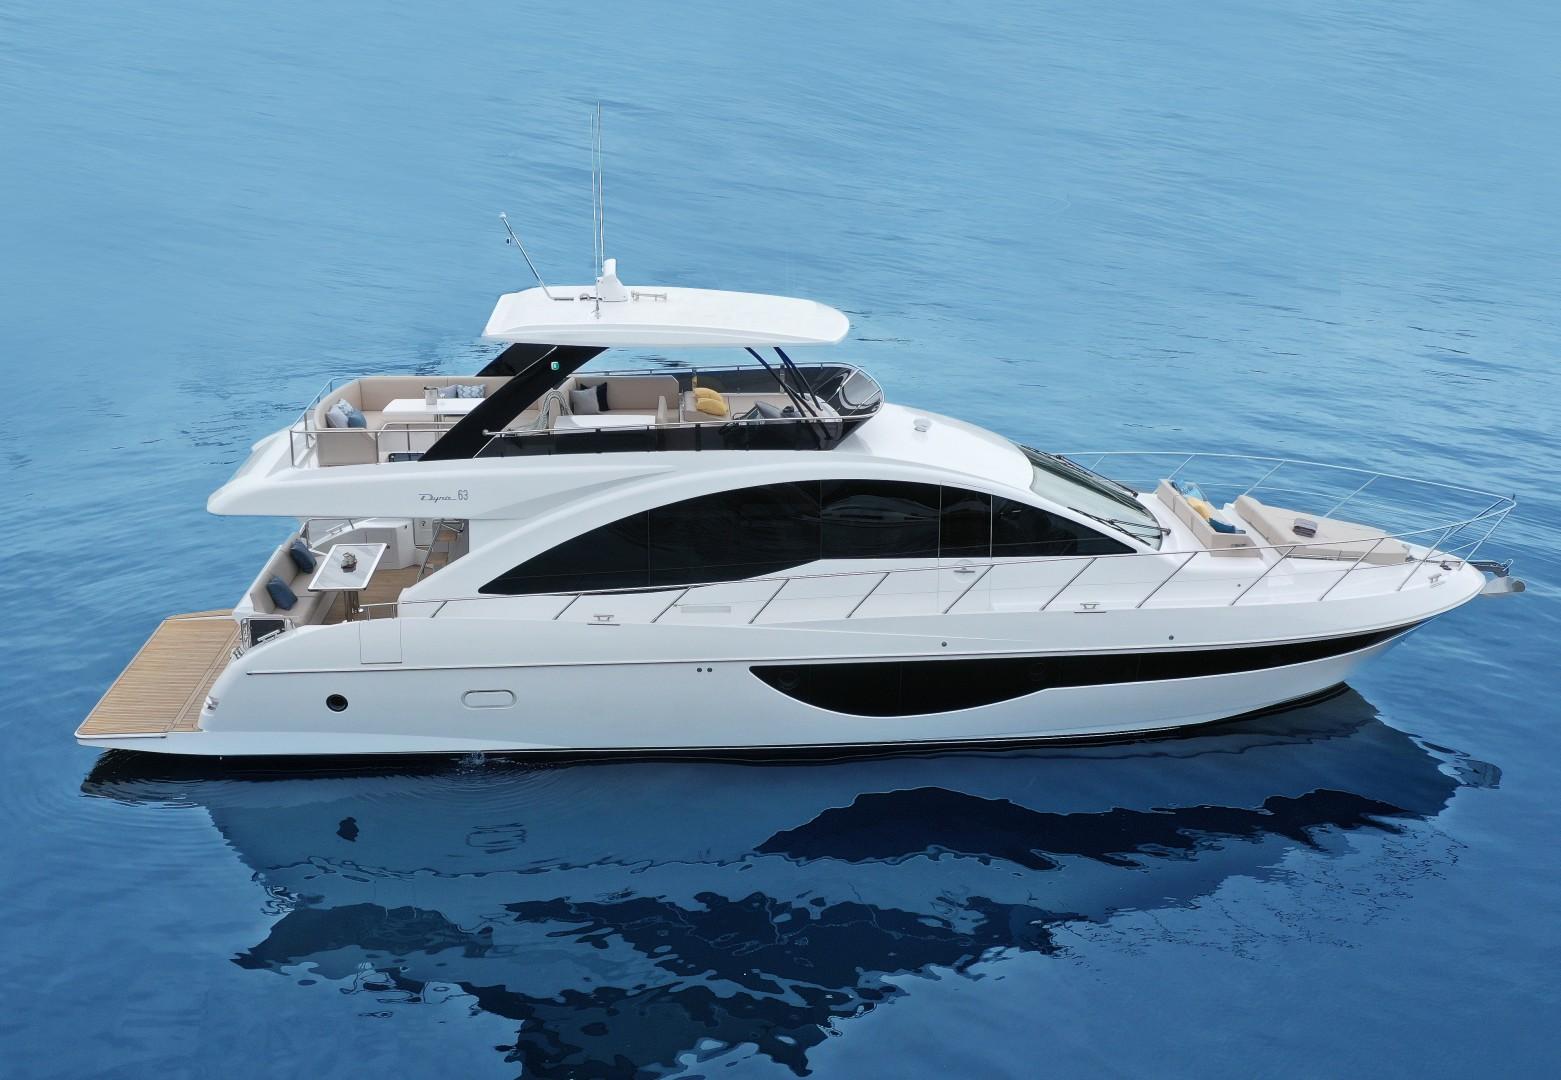 2022 Dyna Yachts 63' Flybridge